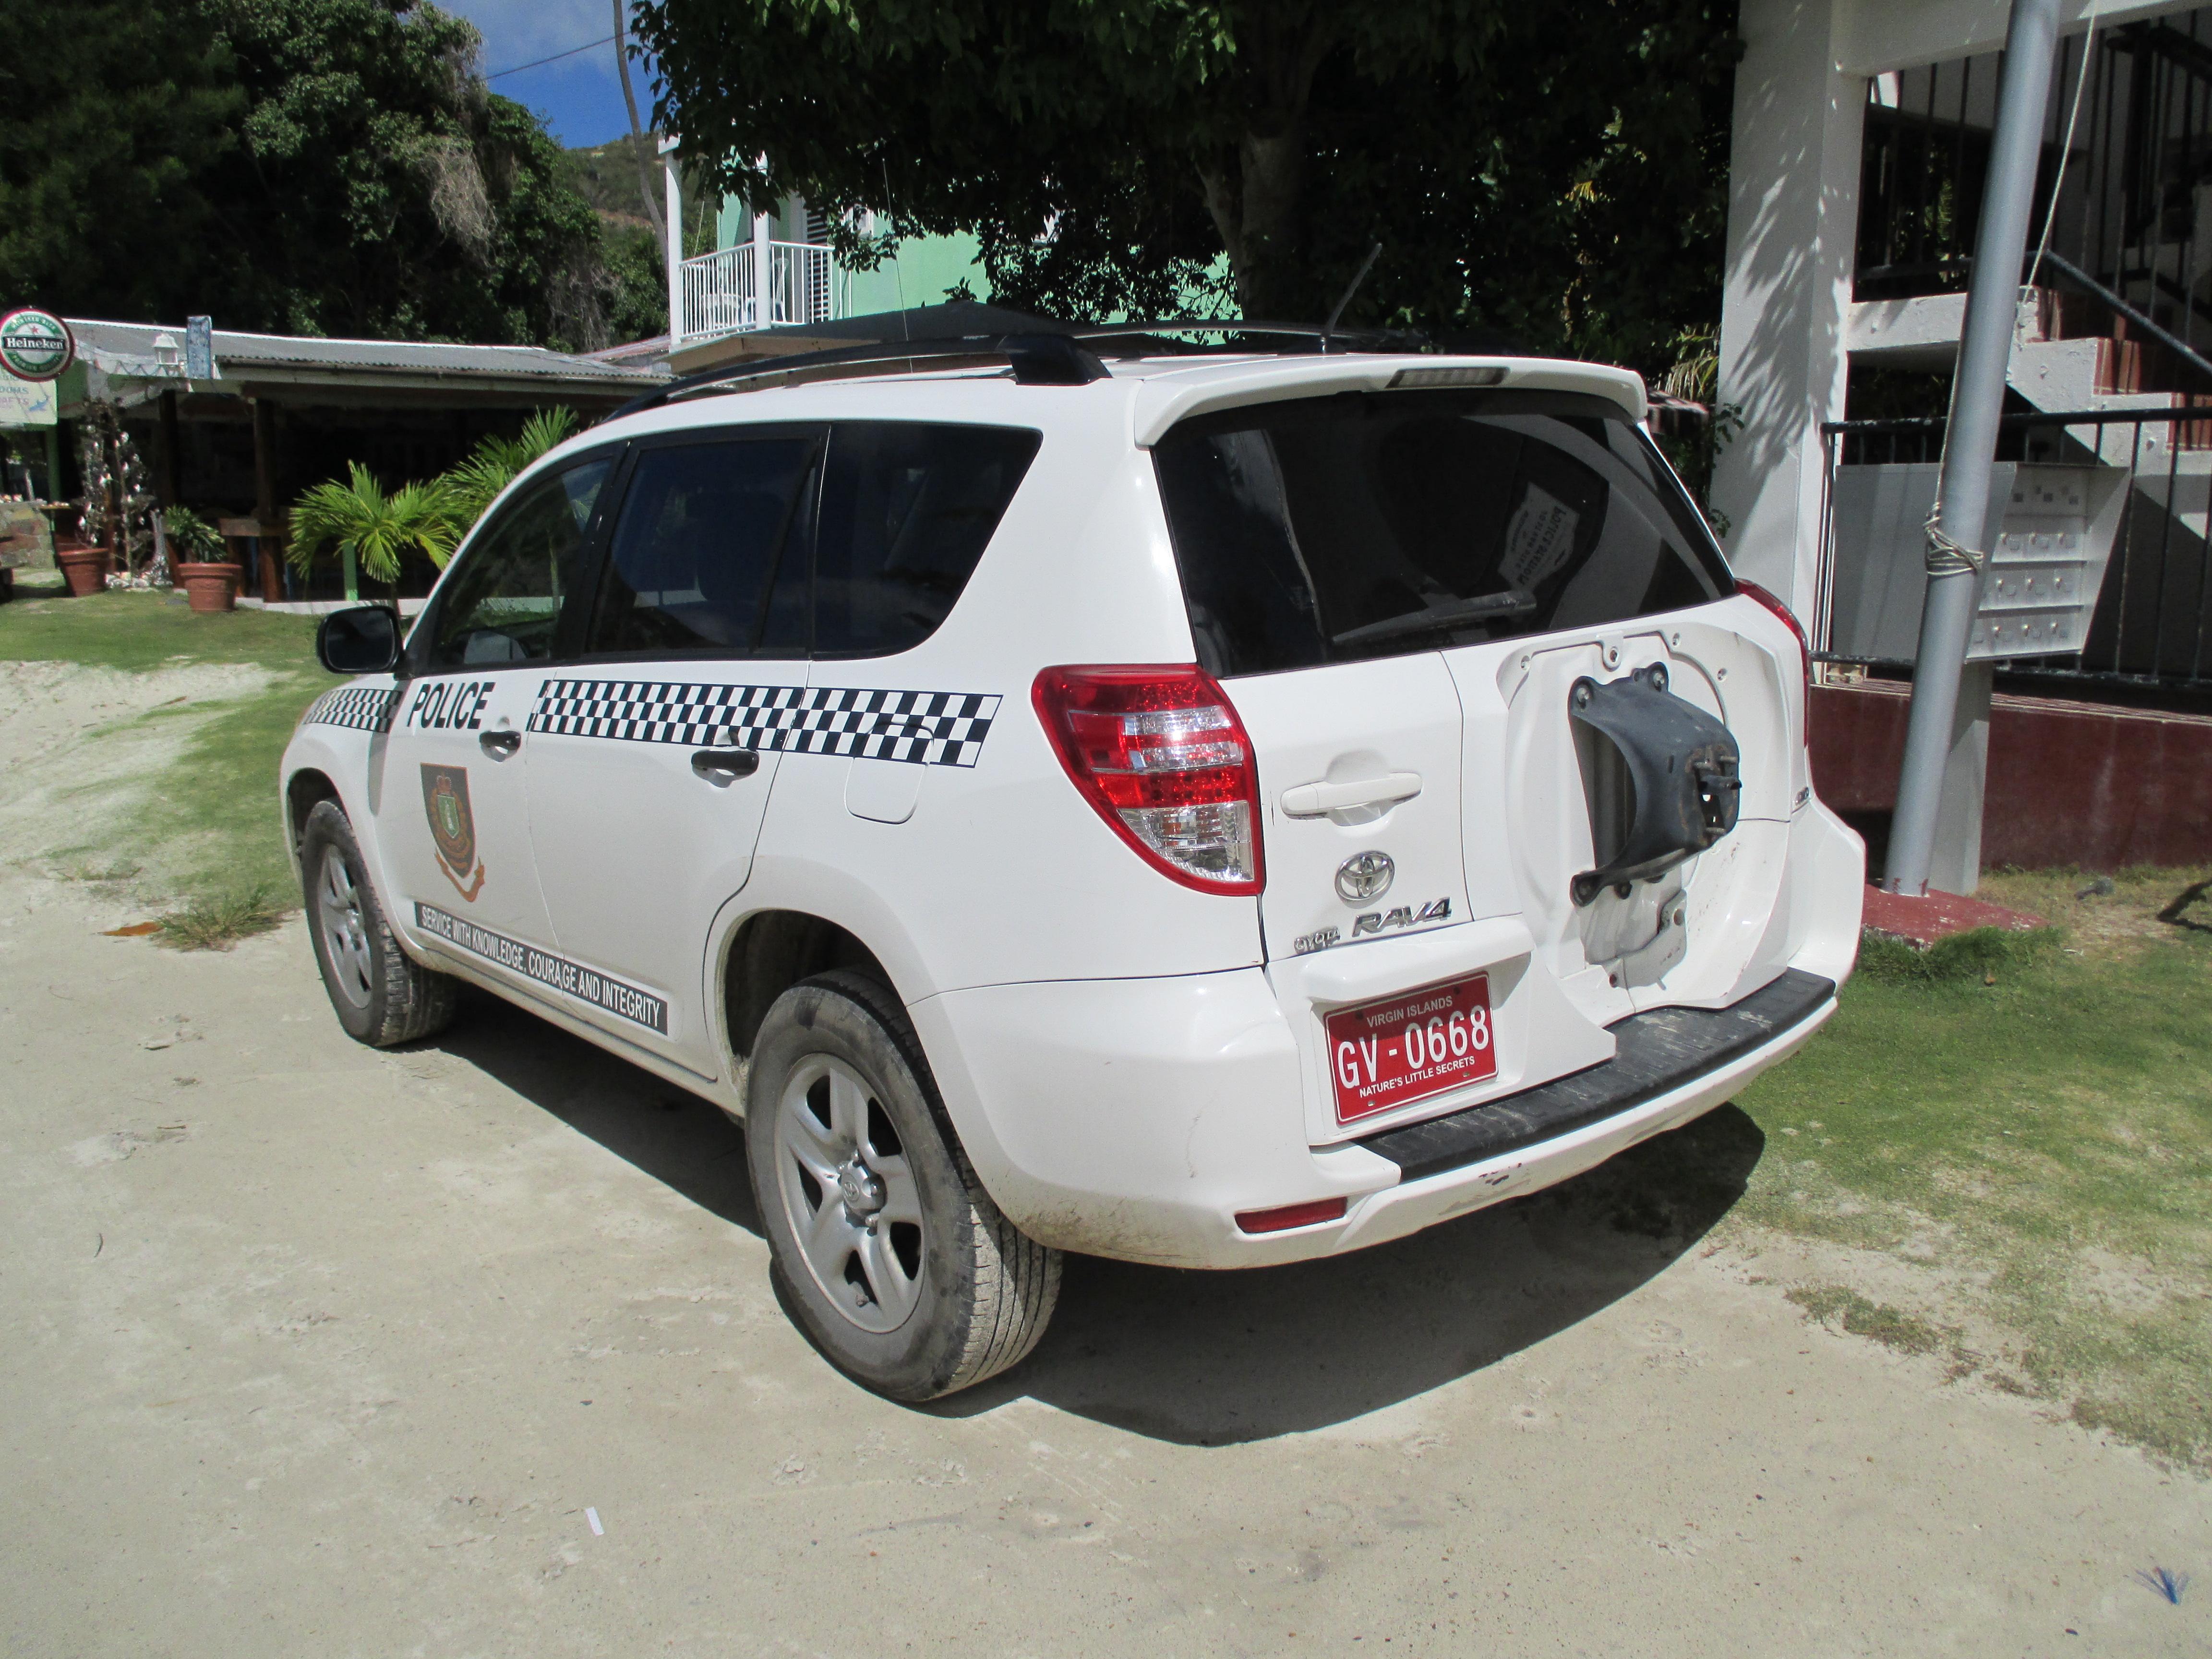 File British Virgin Islands — Jost van Dyke — police automobile